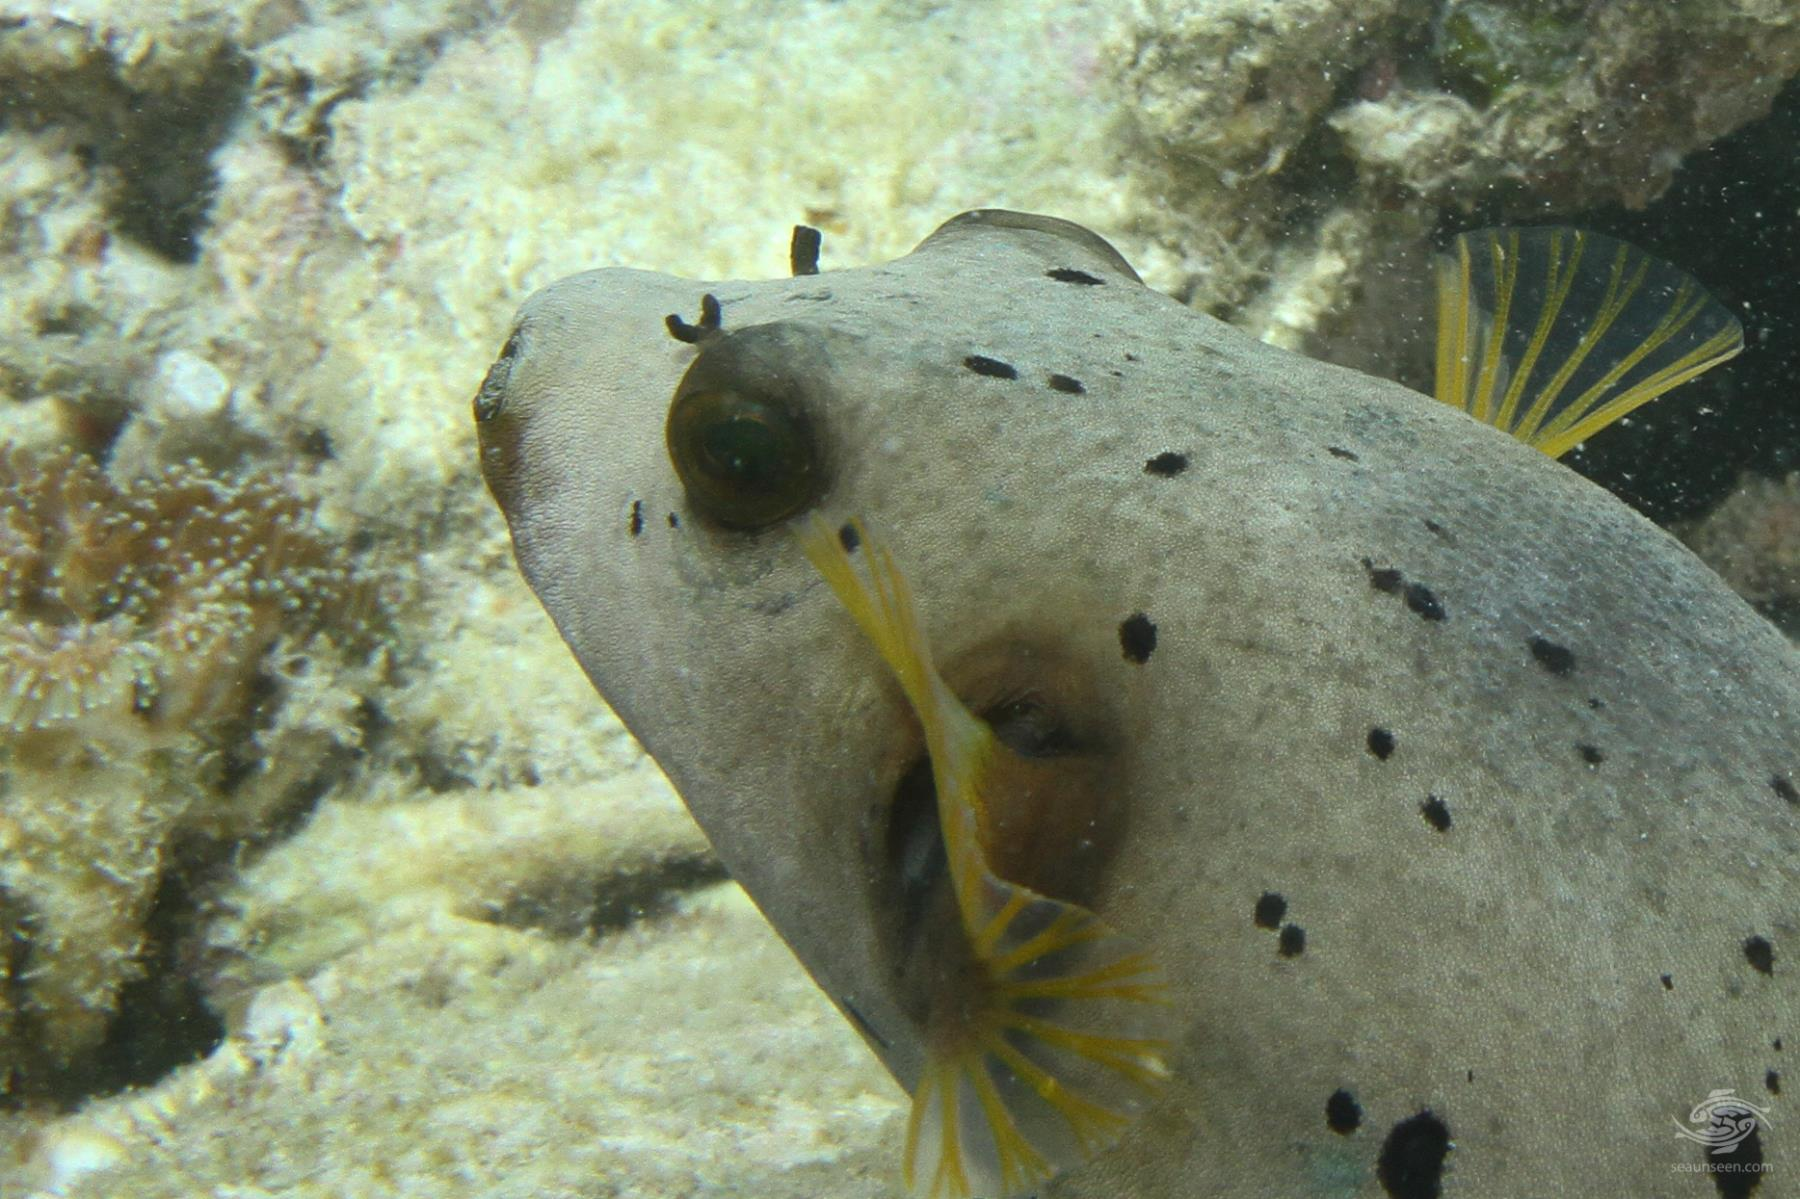 Black spotted pufferfish (Arothron nigropunctatus)